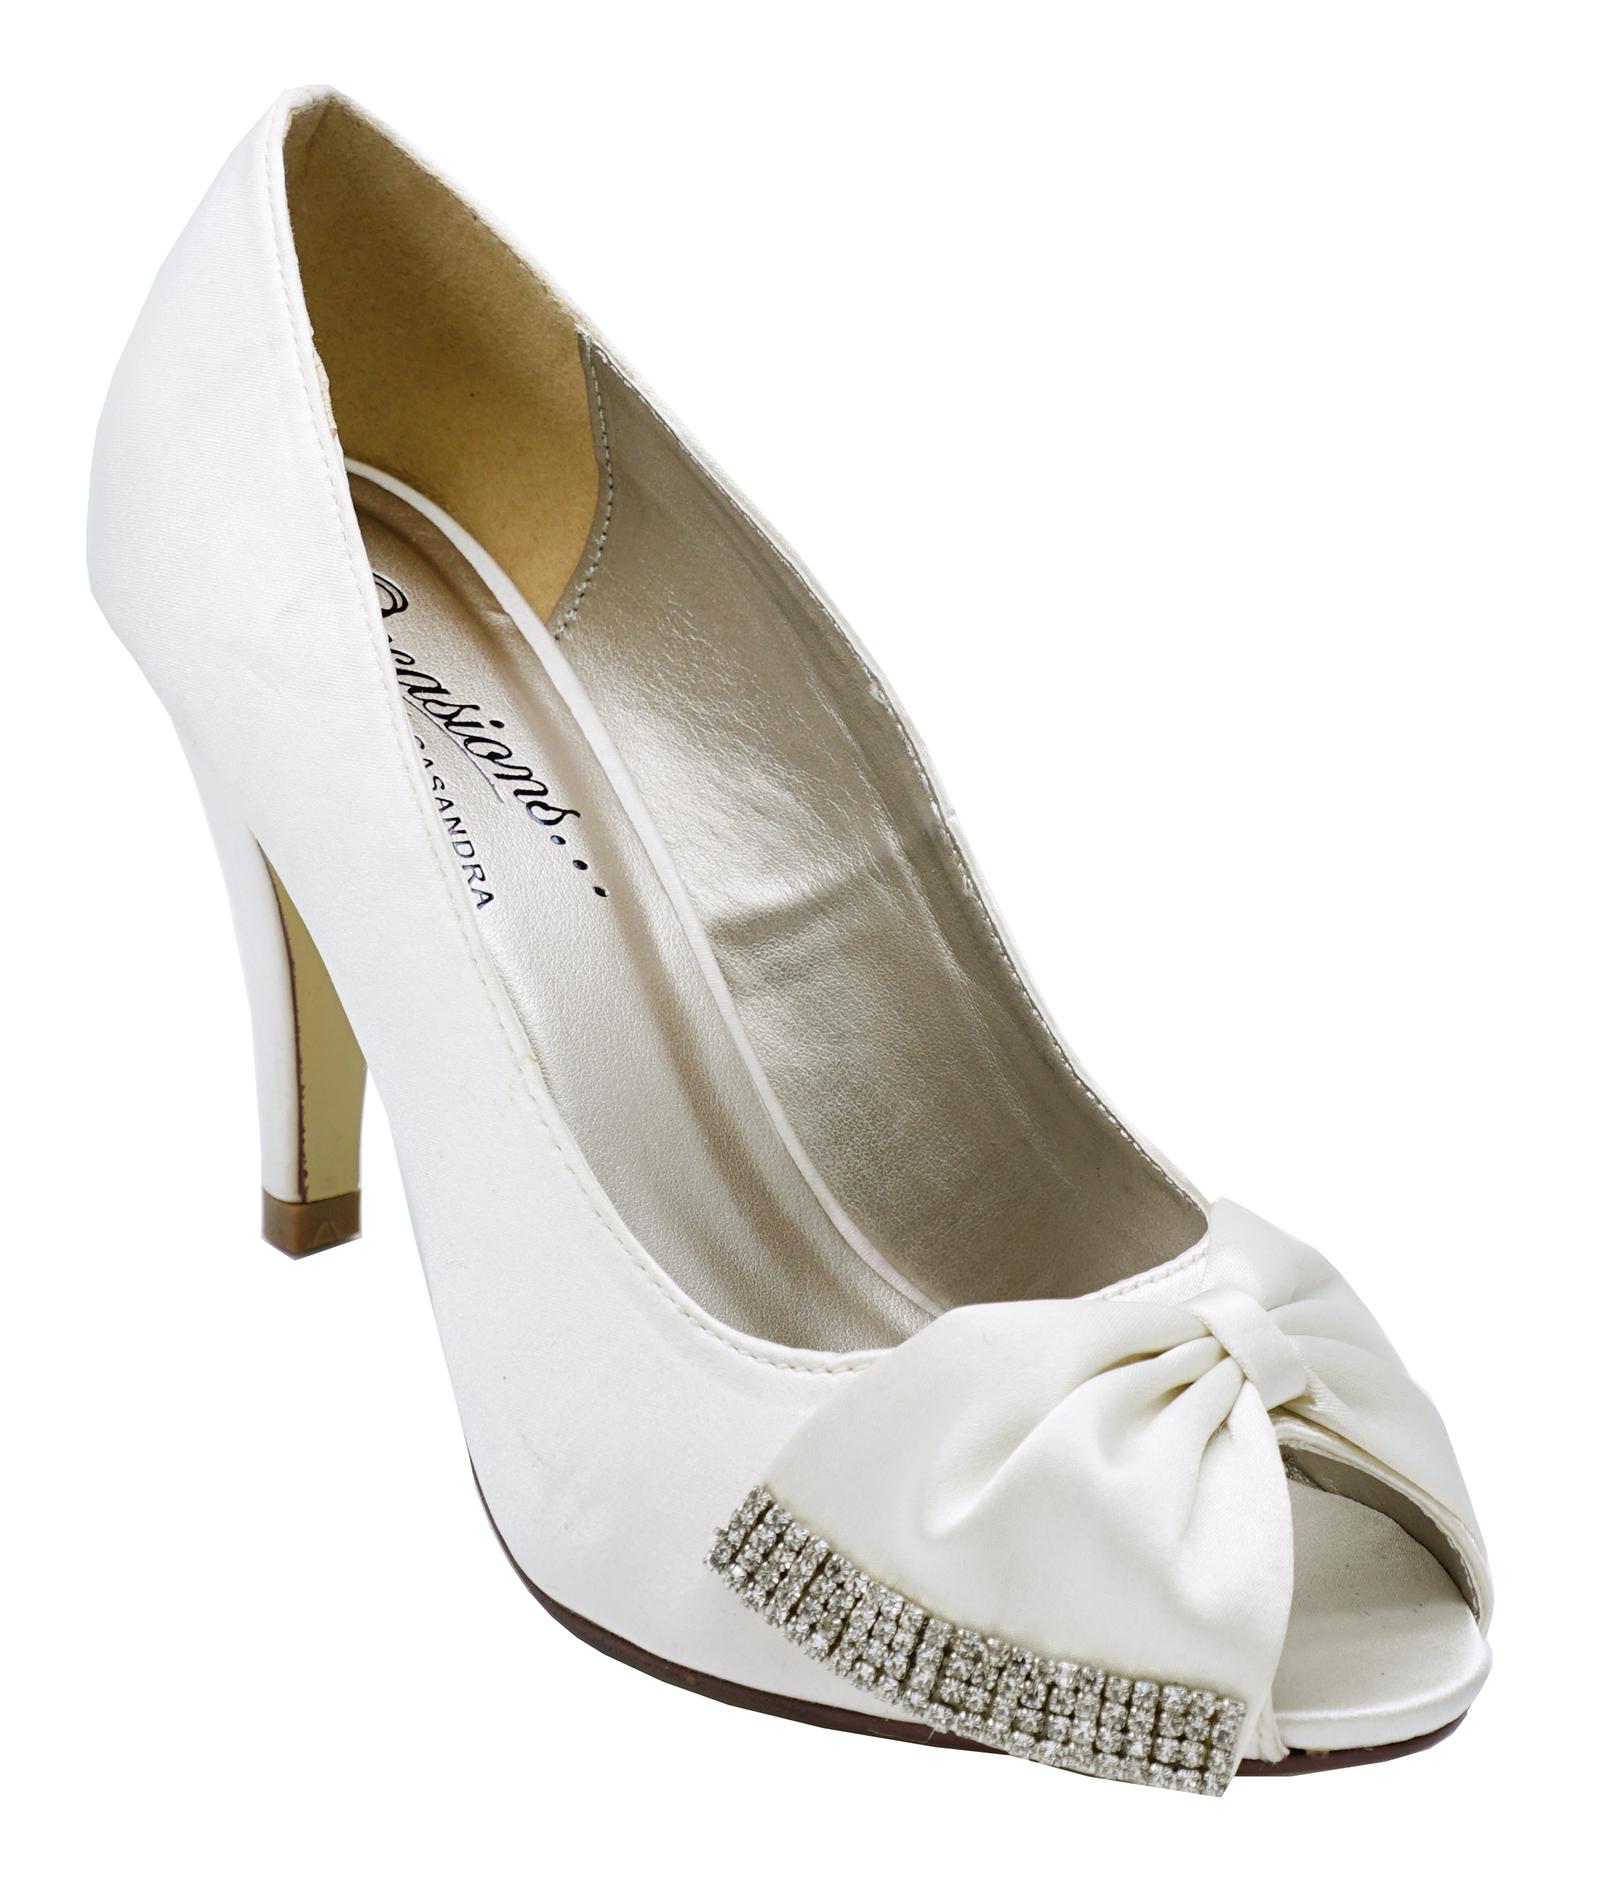 ba9a67b8b917 Sentinel LADIES IVORY SATIN BRIDAL BRIDE BRIDESMAID WEDDING PEEPTOE COURT  SHOES UK 3-8